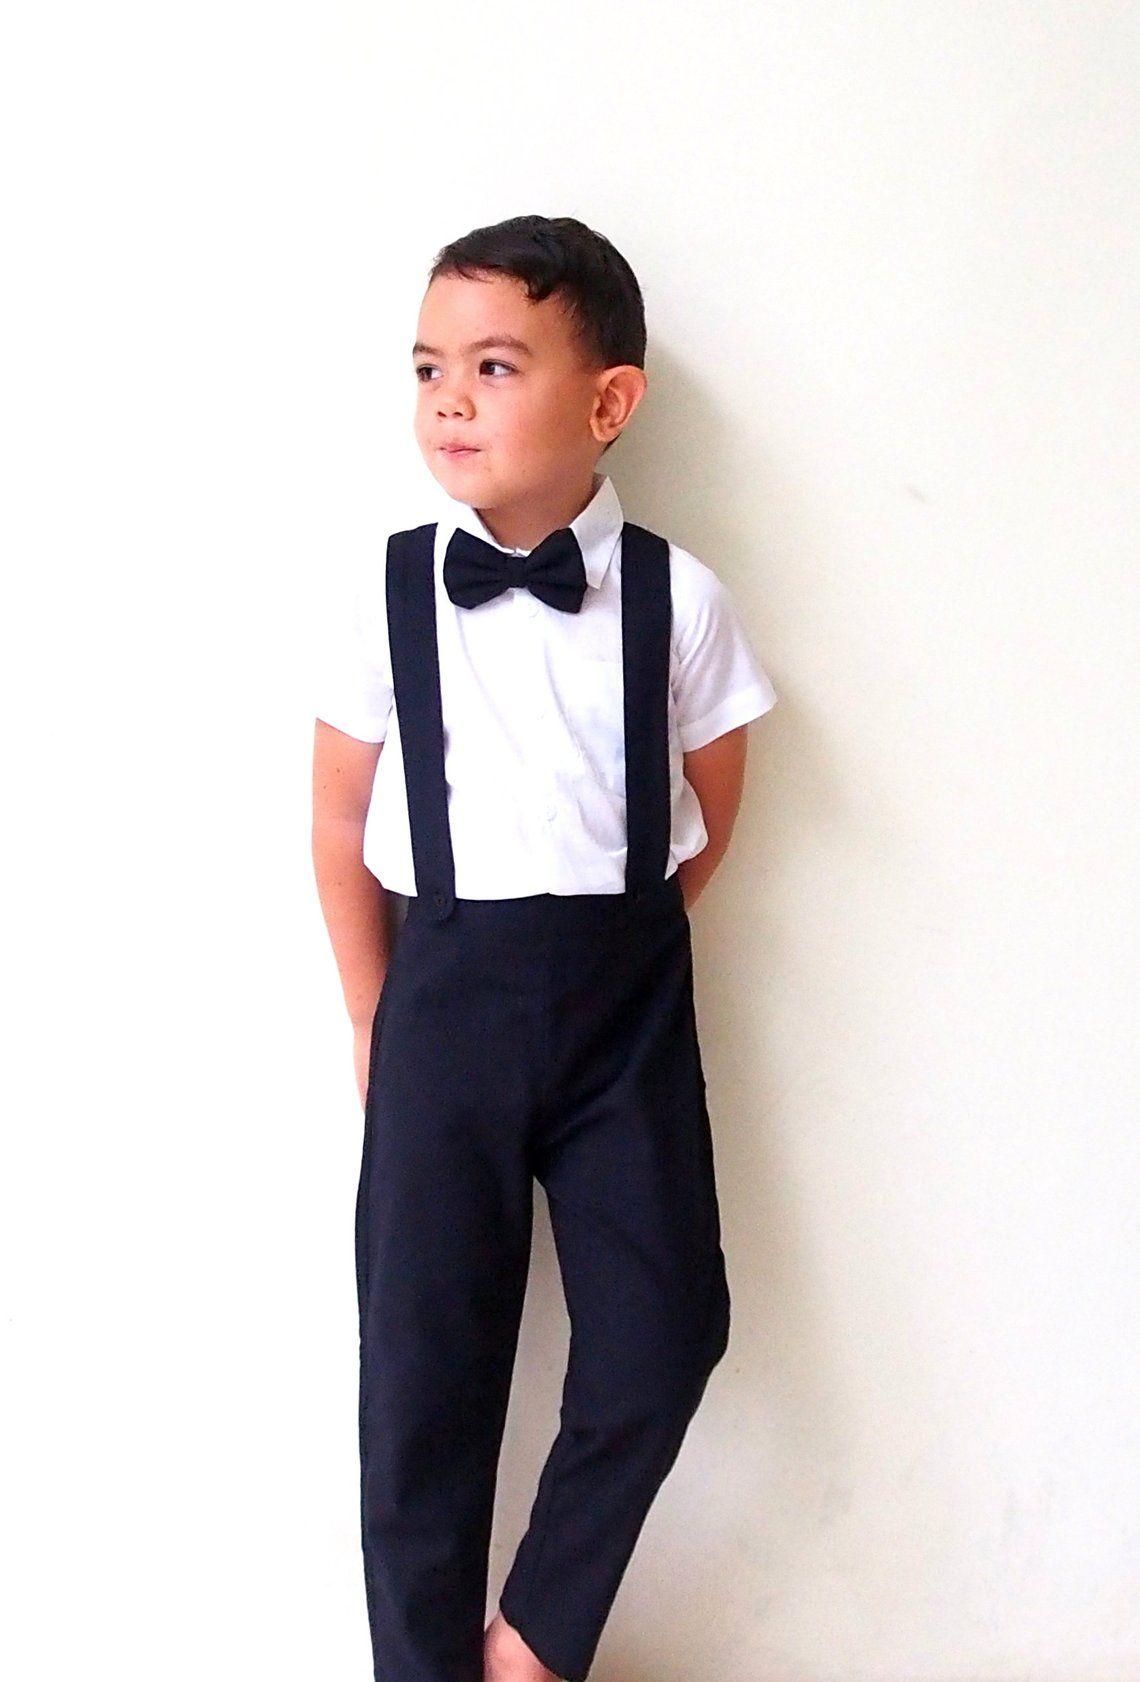 bea43ca3e Boy Christening Outfit - Black,Suspender pants, Boy Linen Suit, Page Boy,  Ring bearer, Baptism, Linen pants, newsboy,Boy wedding sui